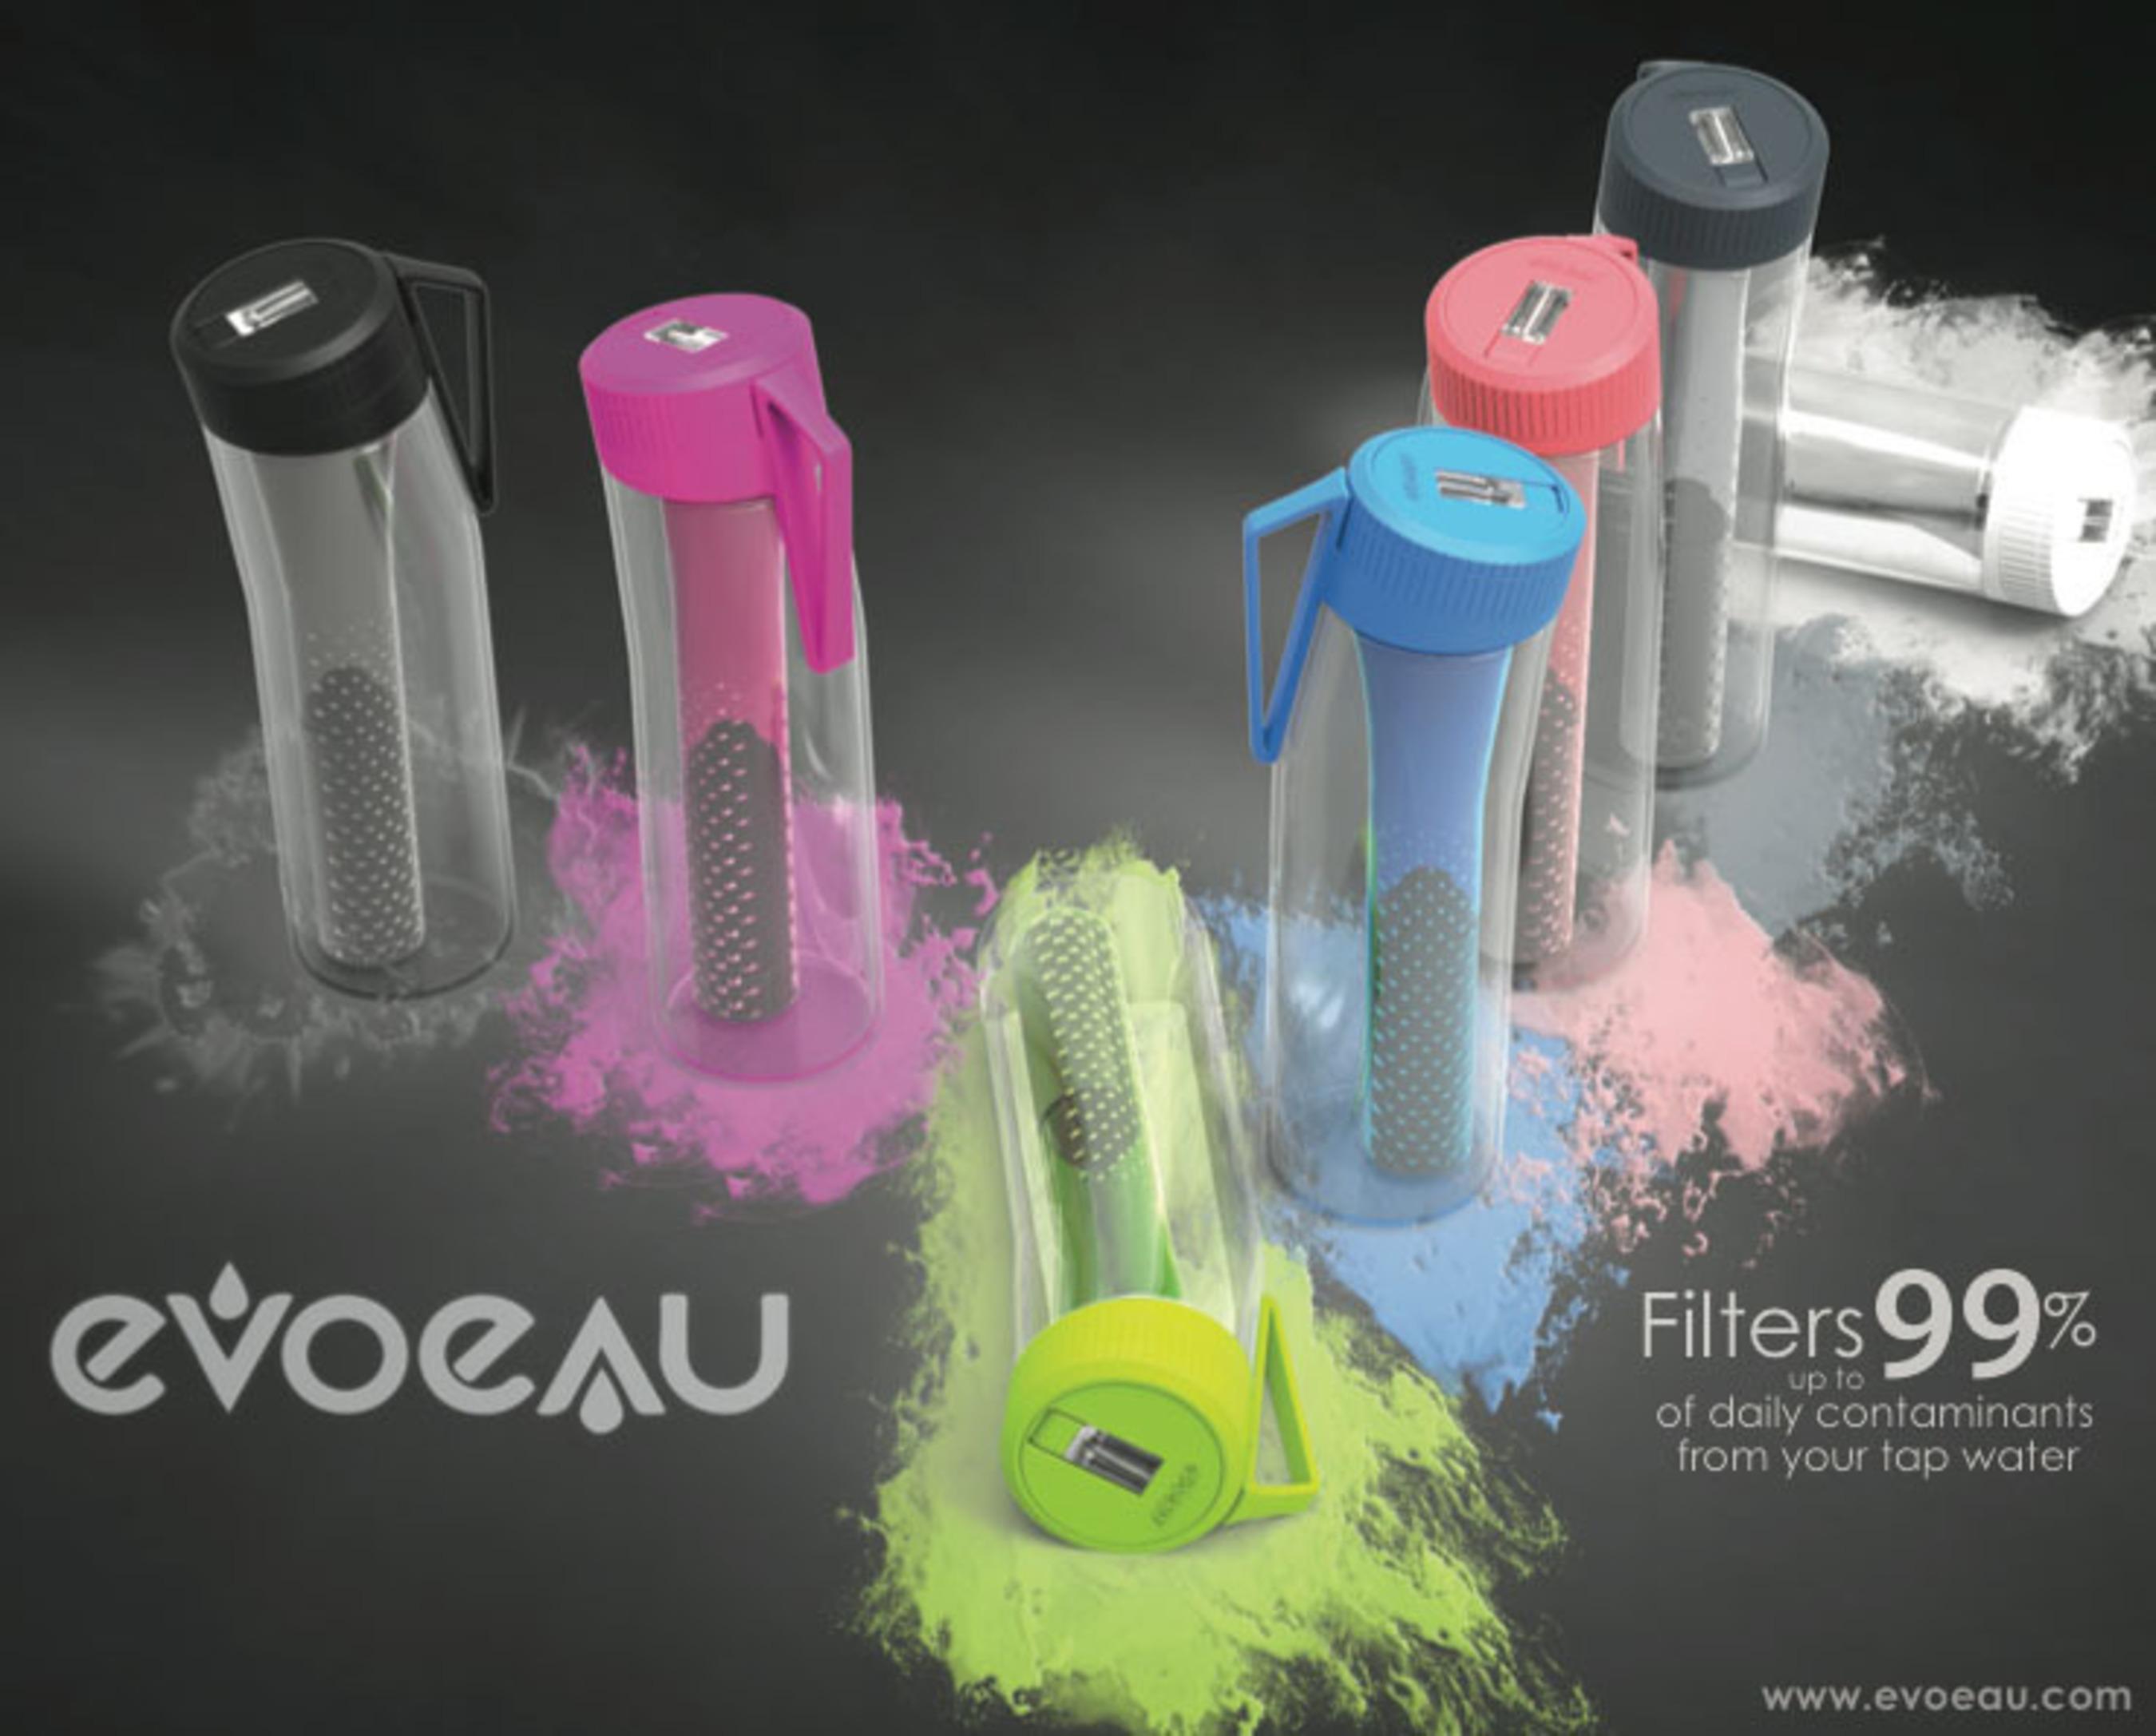 Evo Eau Filtration bottles remove up to 99% of contaminants in 7 stylish colors!. (PRNewsFoto/Evo Eau) (PRNewsFoto/EVO EAU)